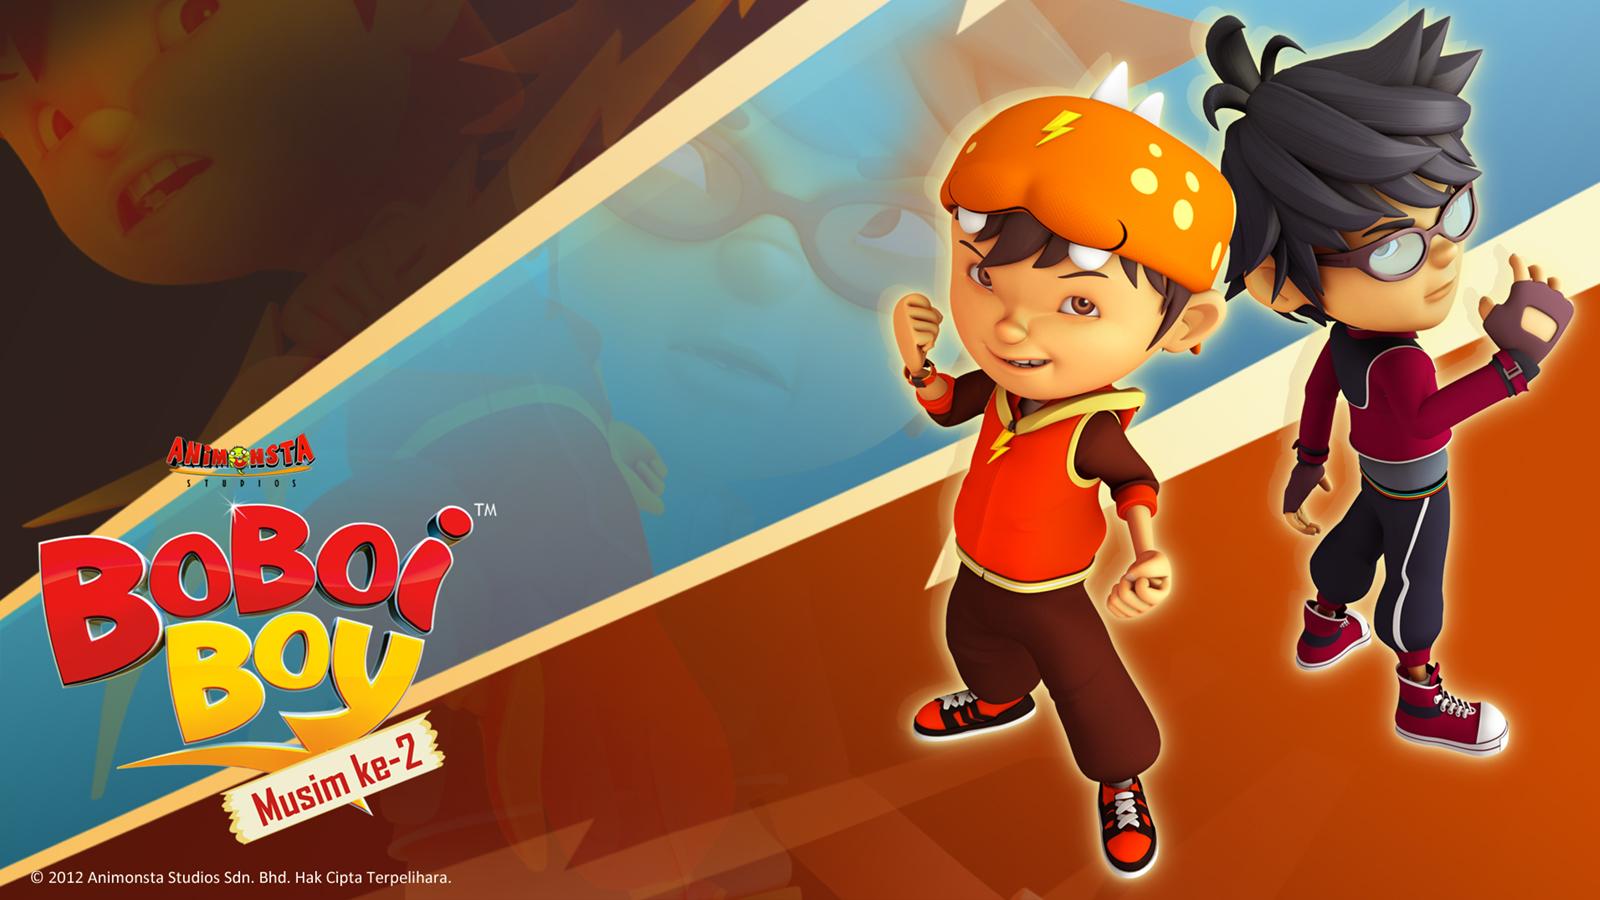 Gambar BoboiBoy Musim ke-2 - JIWAROSAK.COM